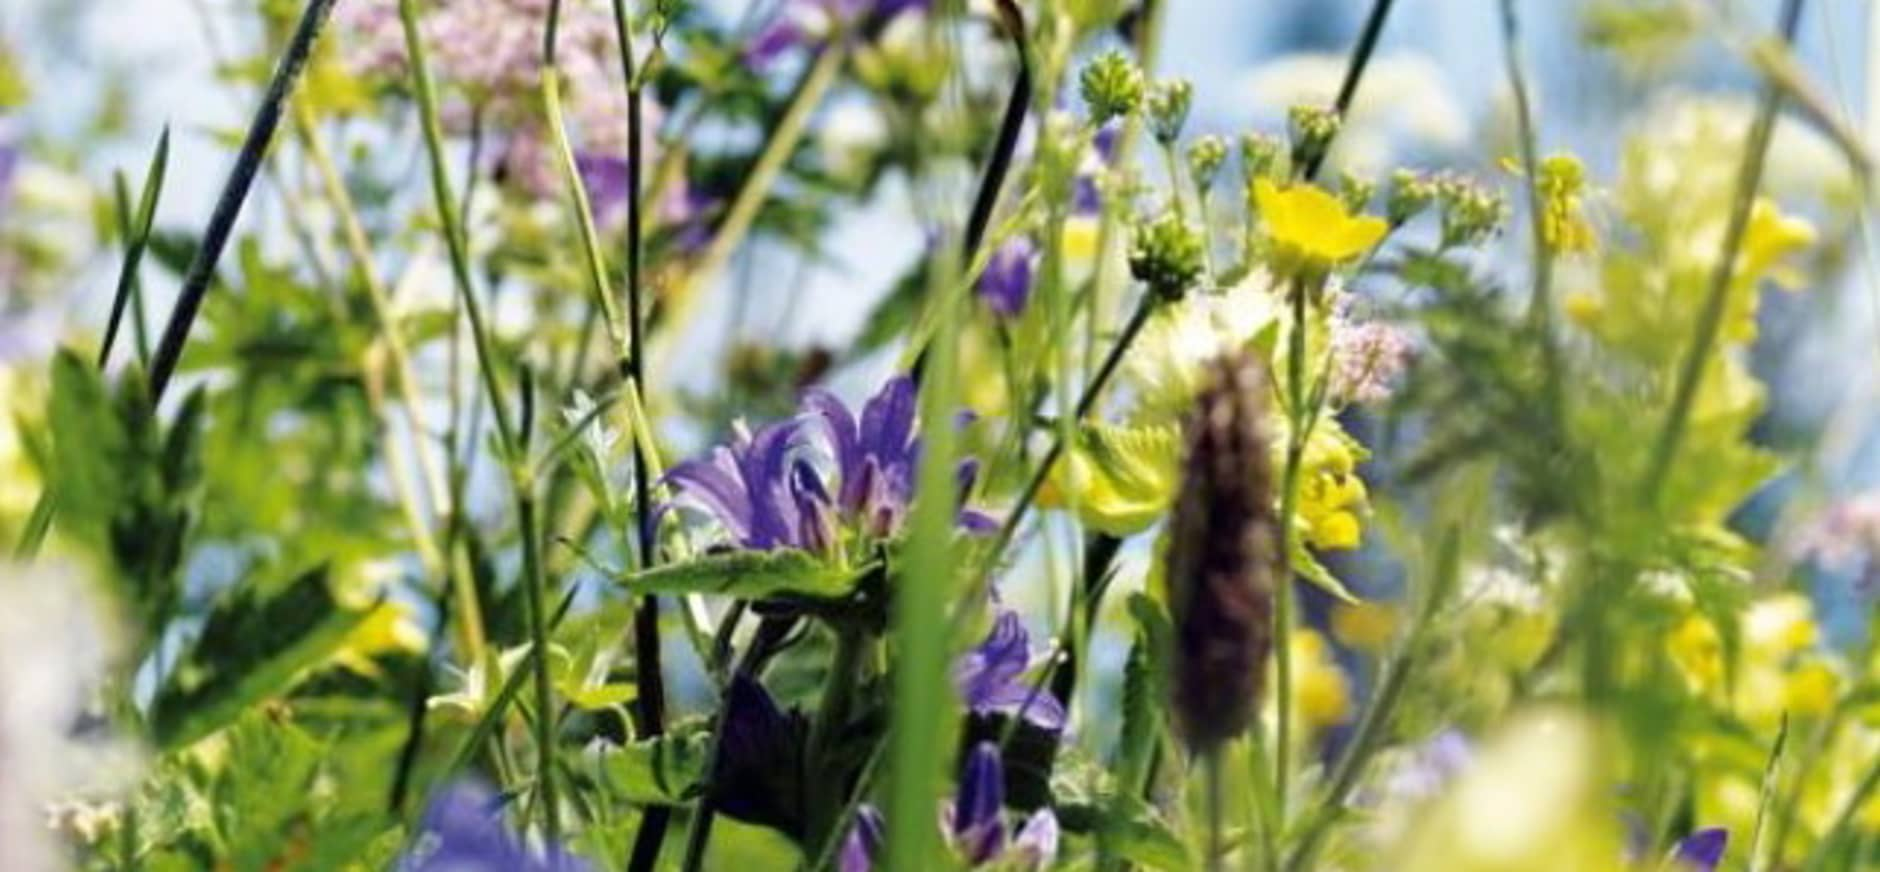 Weleda en Natuurmonumenten creëren samen 100.000 m² bloemrijke natuur